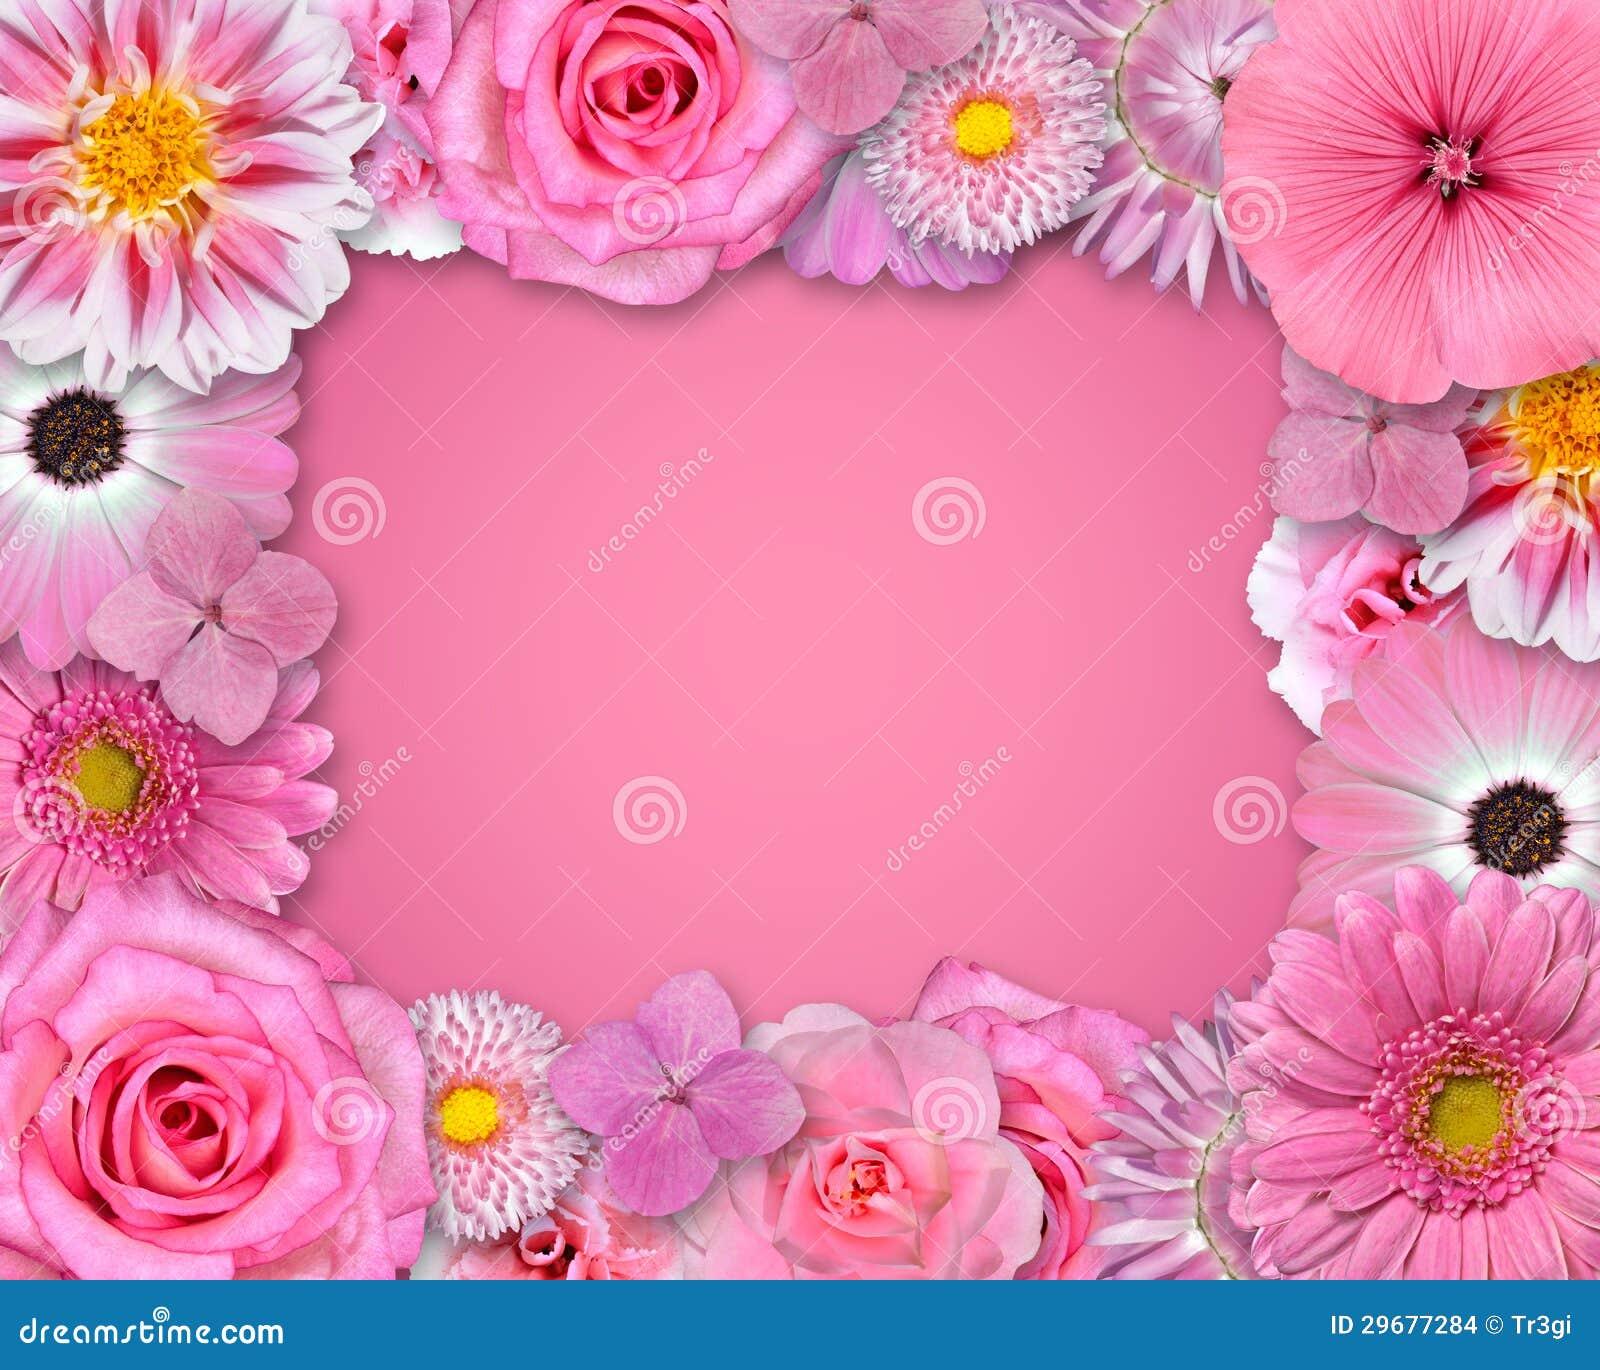 blumen rahmen mit rosa blumen stockbilder bild 29677284. Black Bedroom Furniture Sets. Home Design Ideas